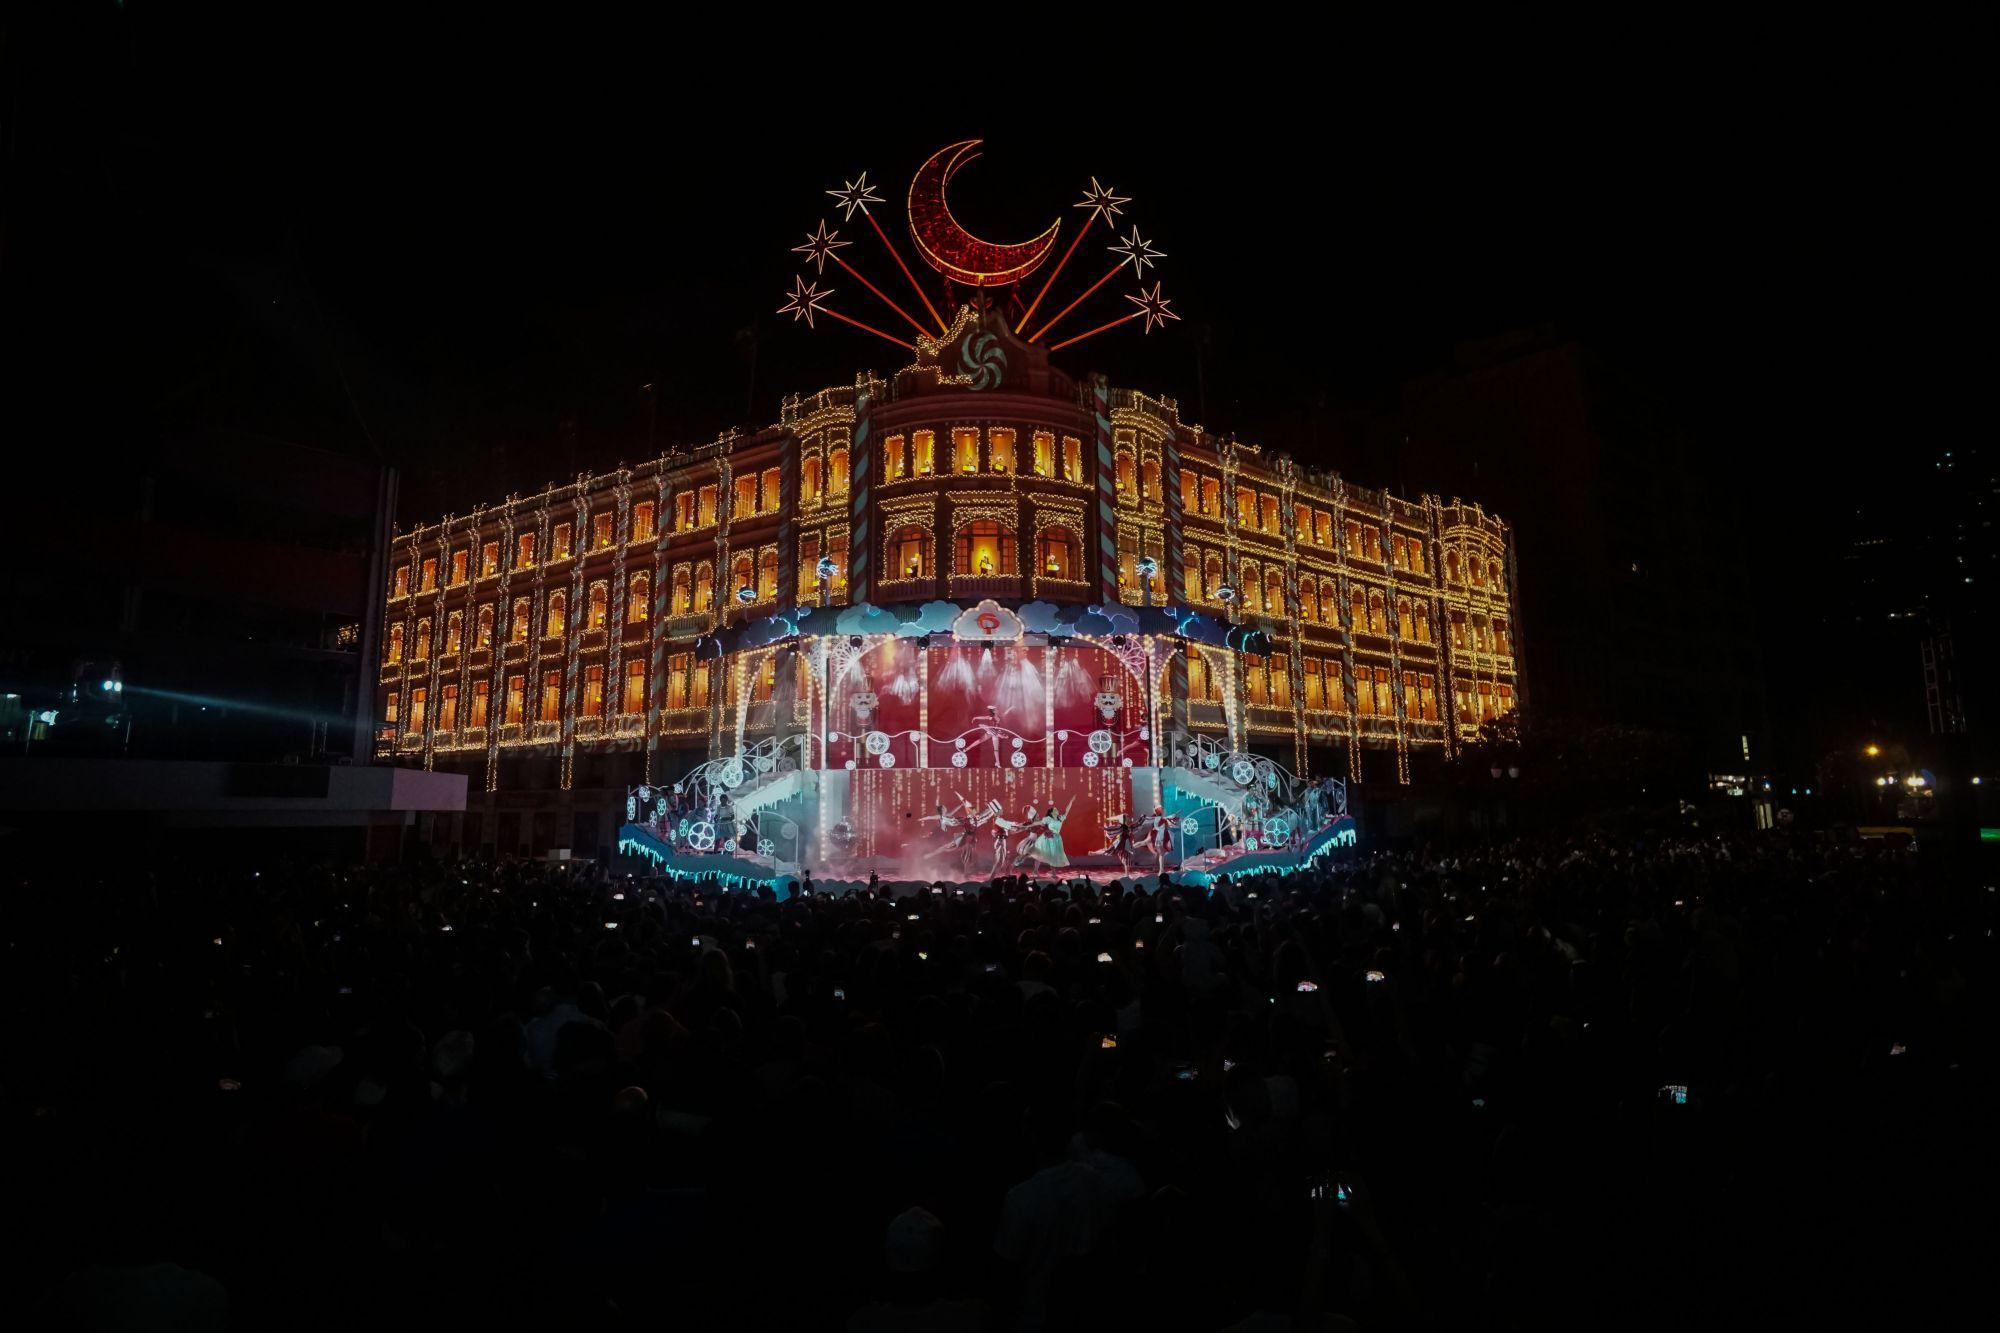 Vídeo: Assista ao espetáculo de Natal do Palácio Avenida 2018